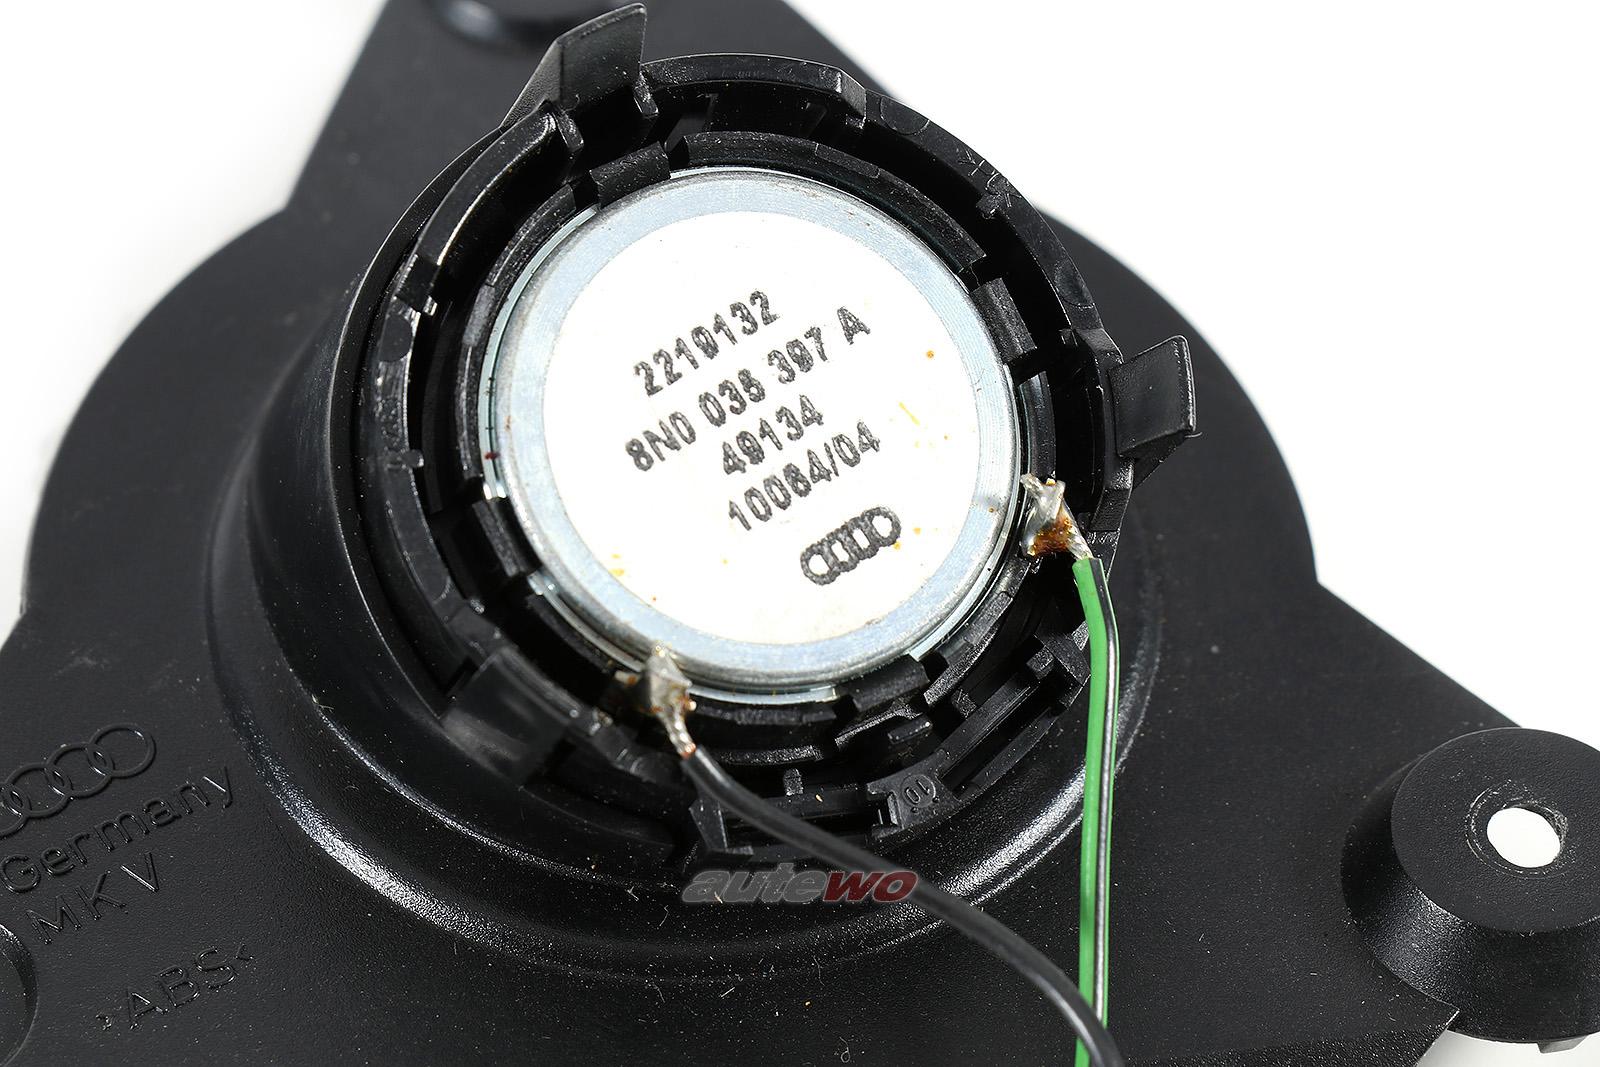 8N0035397A Audi TT 8N Hochton-Lautsprecher BOSE Soundystem Vorne